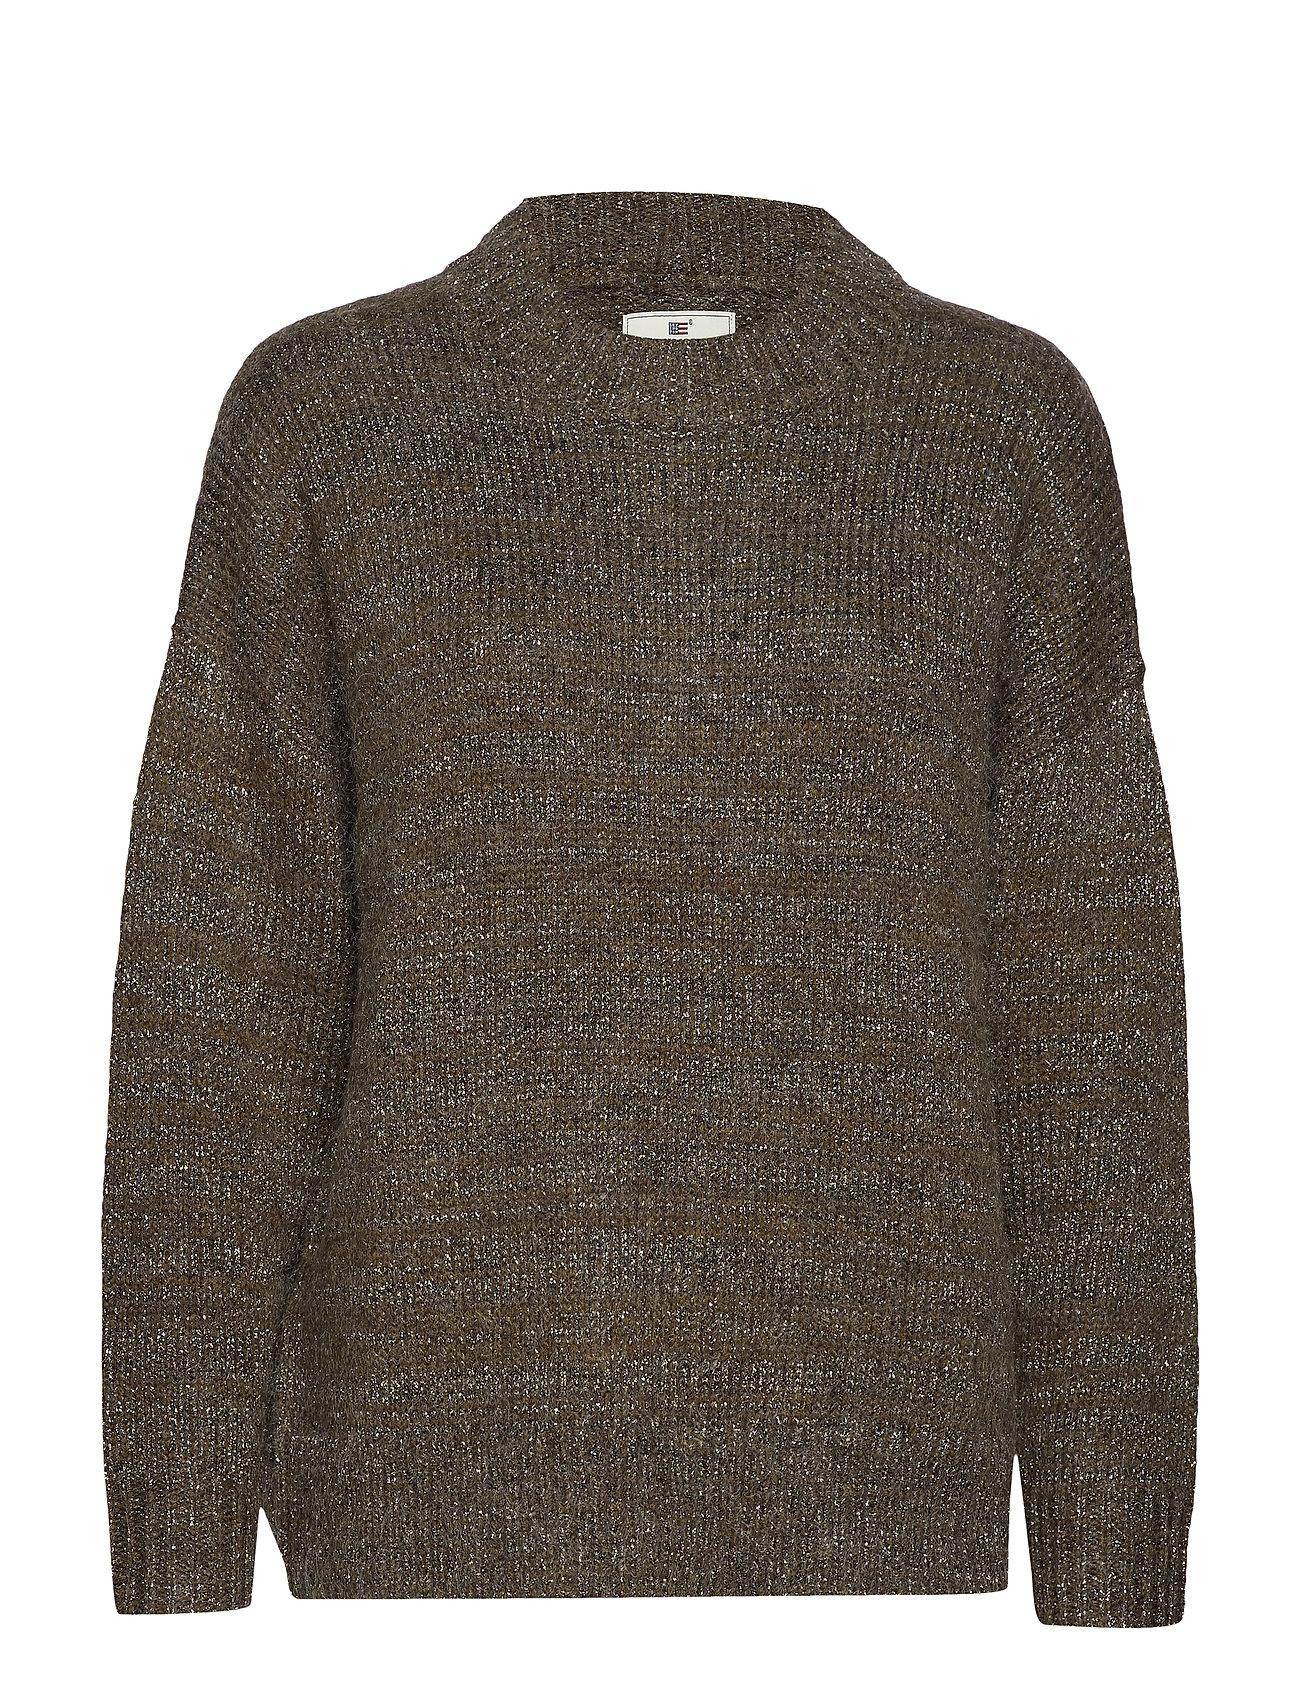 Lexington Clothing Lindsay Sweater